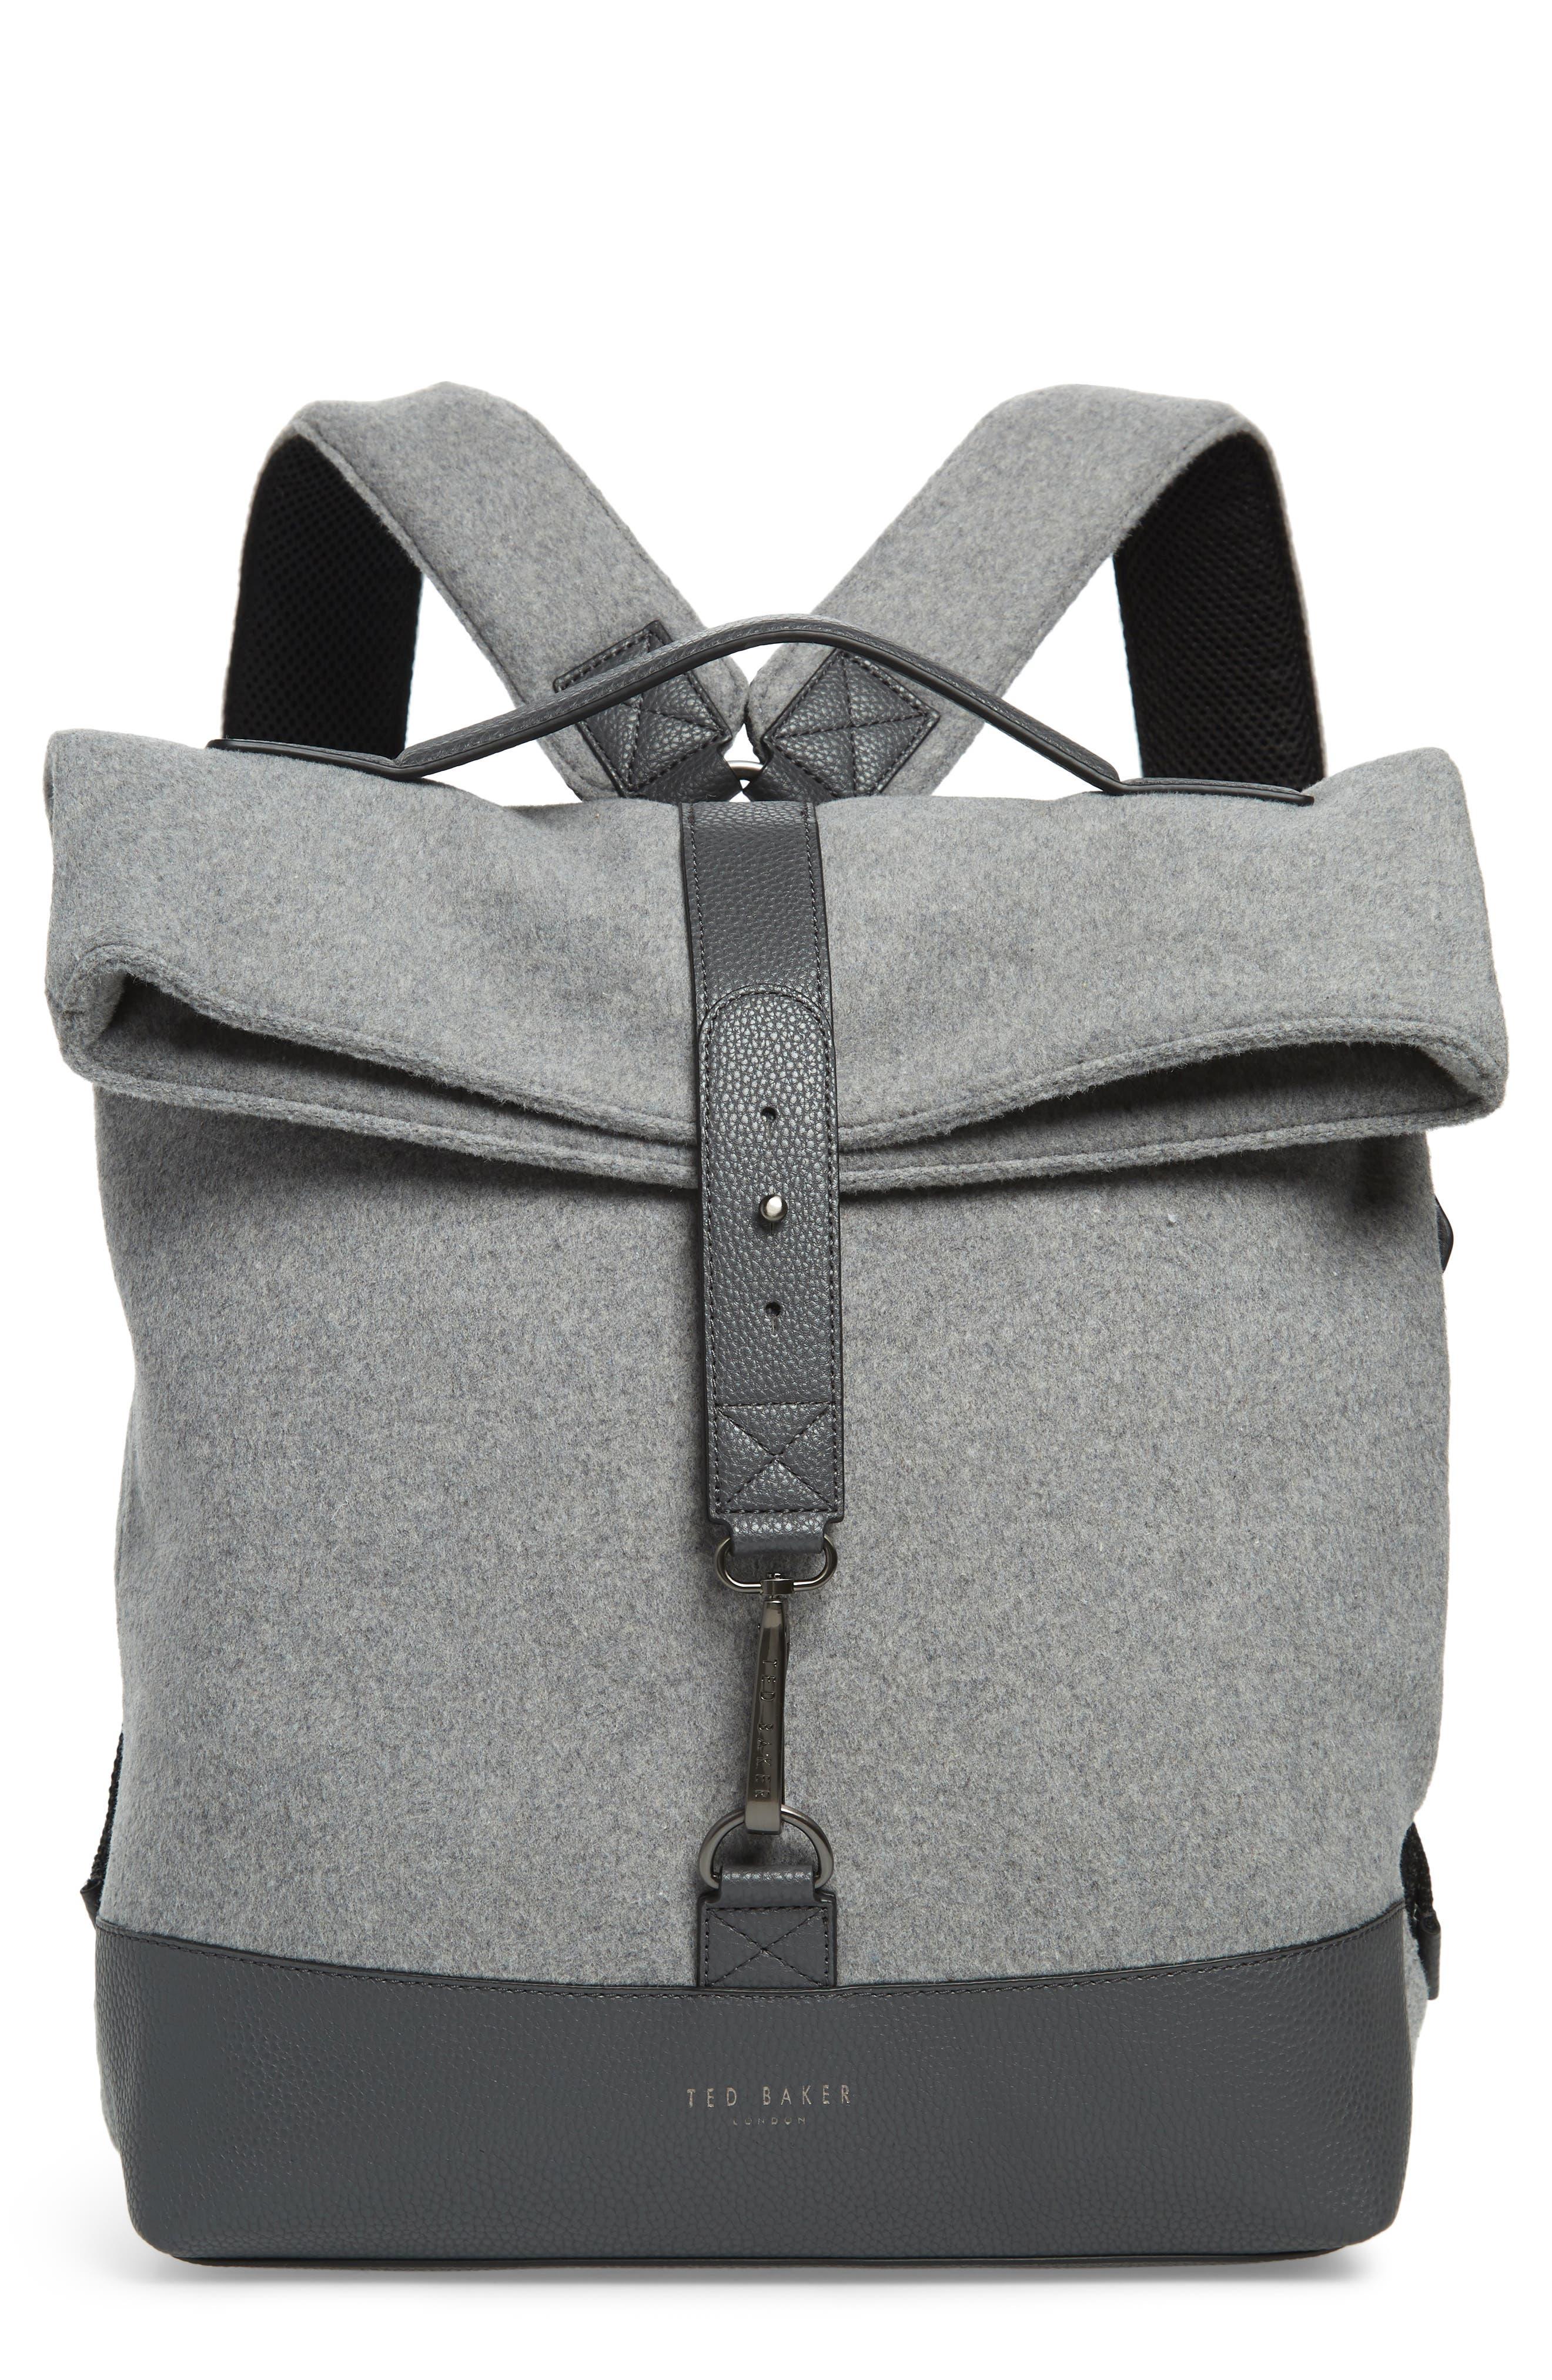 Cashed Backpack,                         Main,                         color,